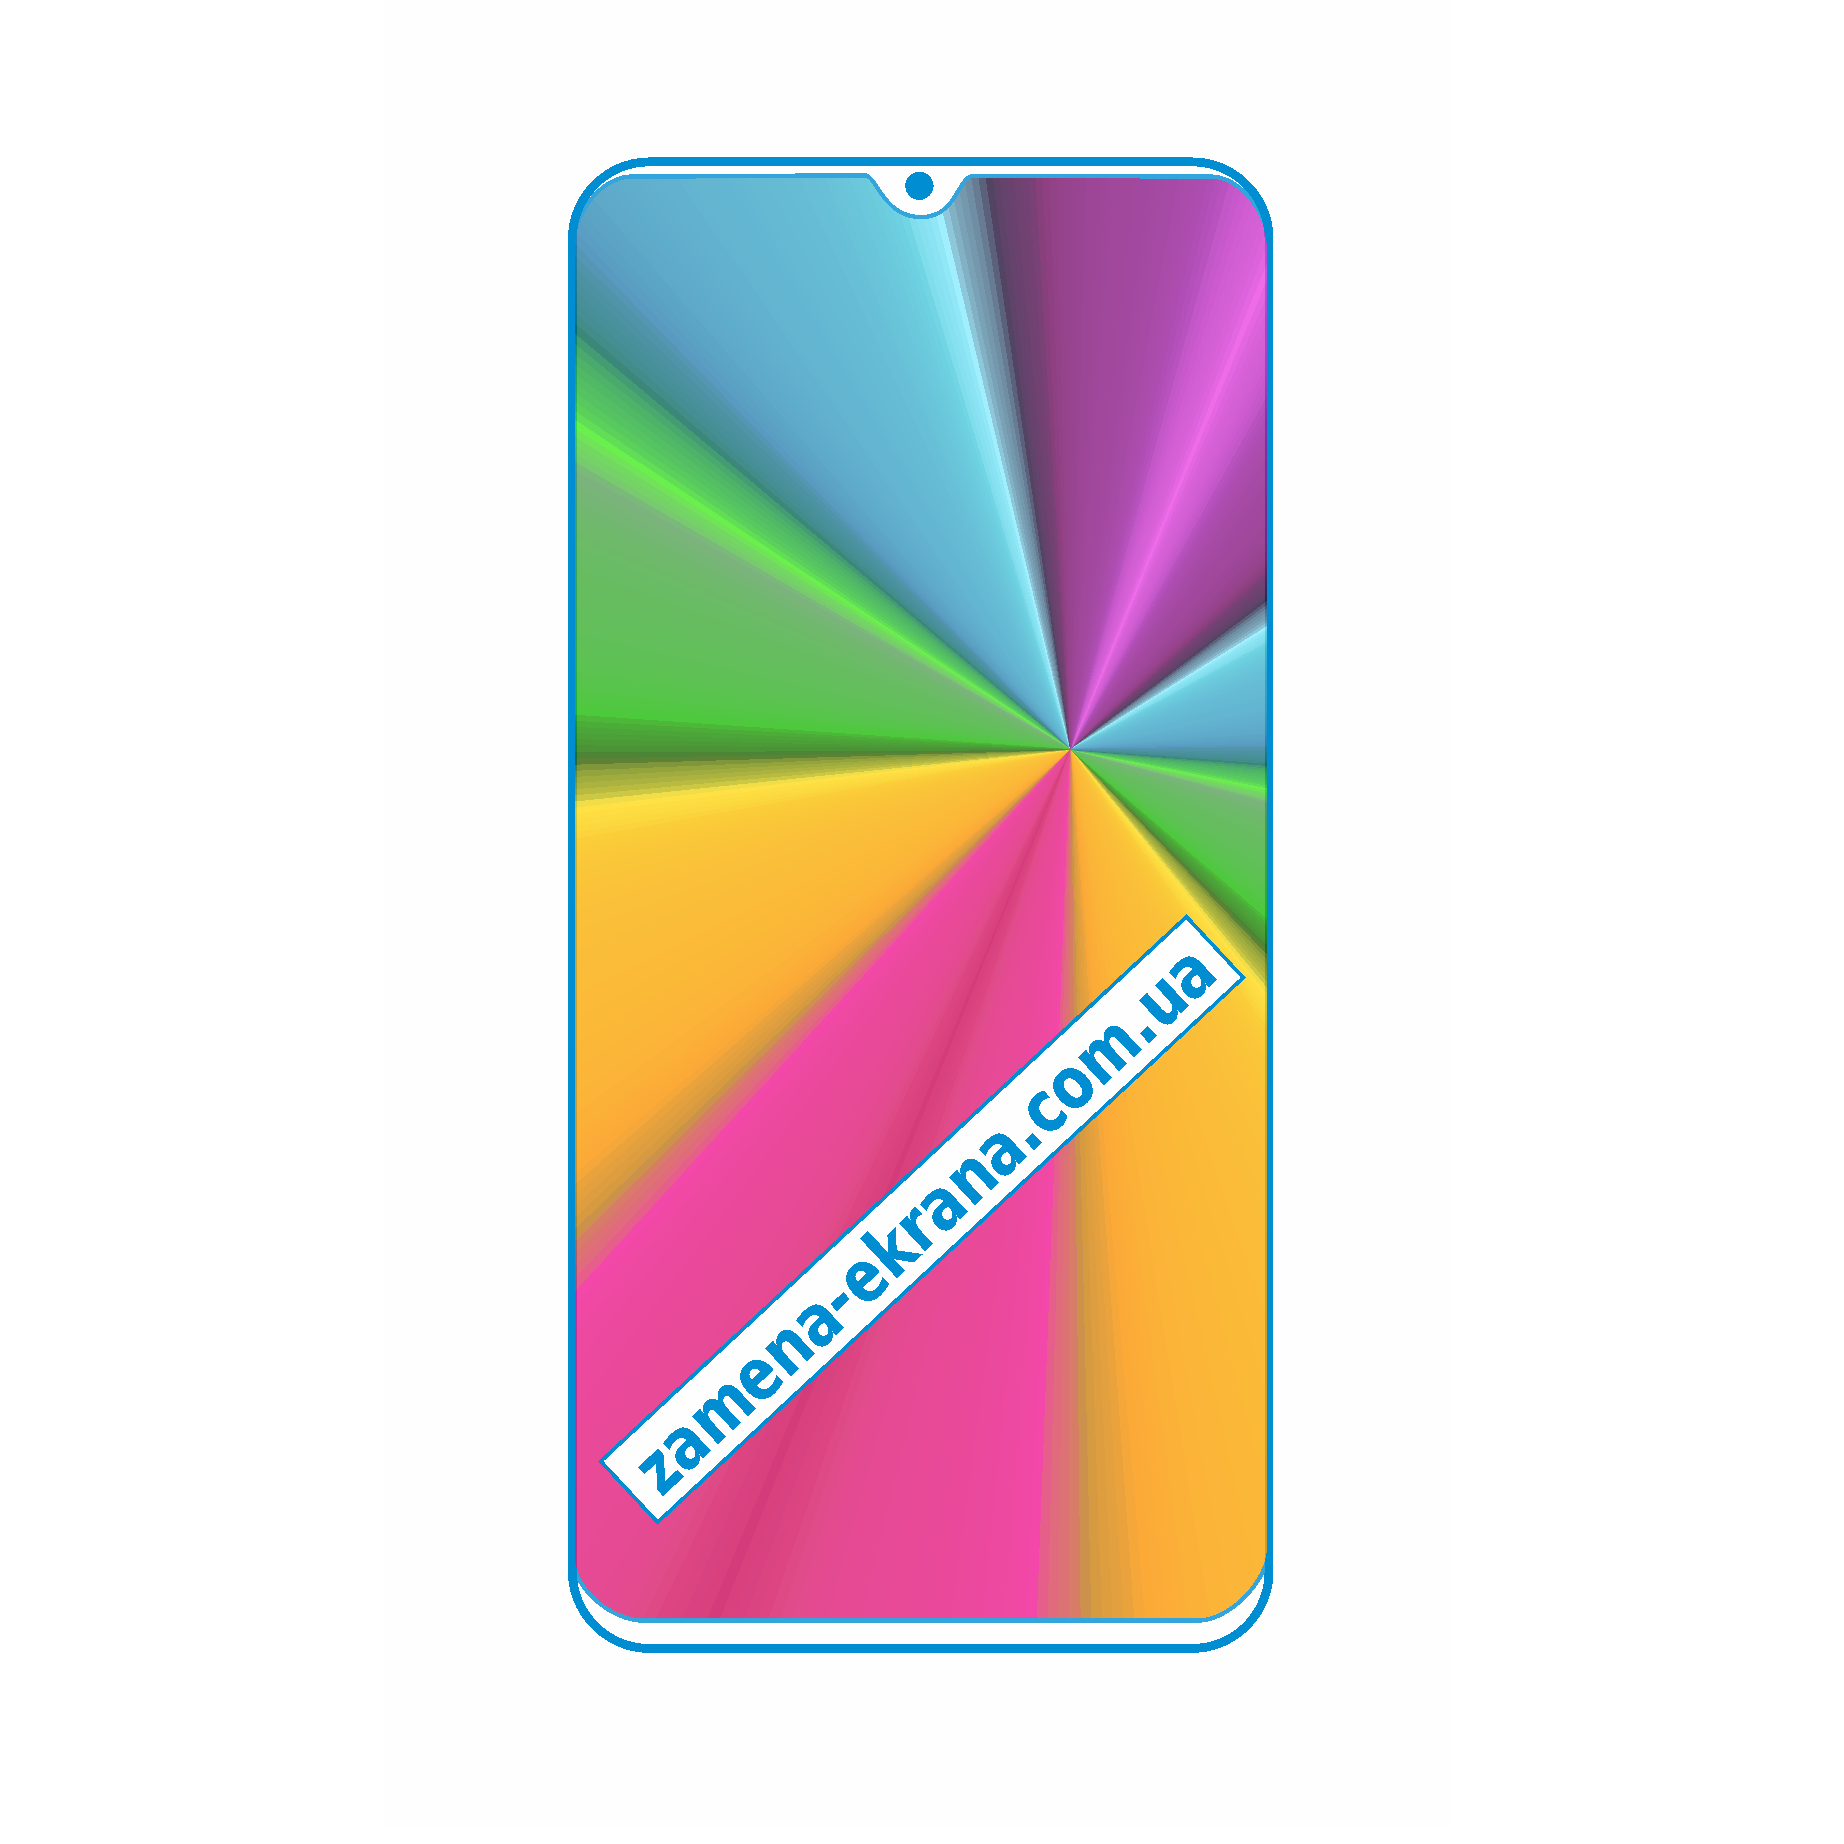 стекло для наклейки Huawei p 30 pro new edition